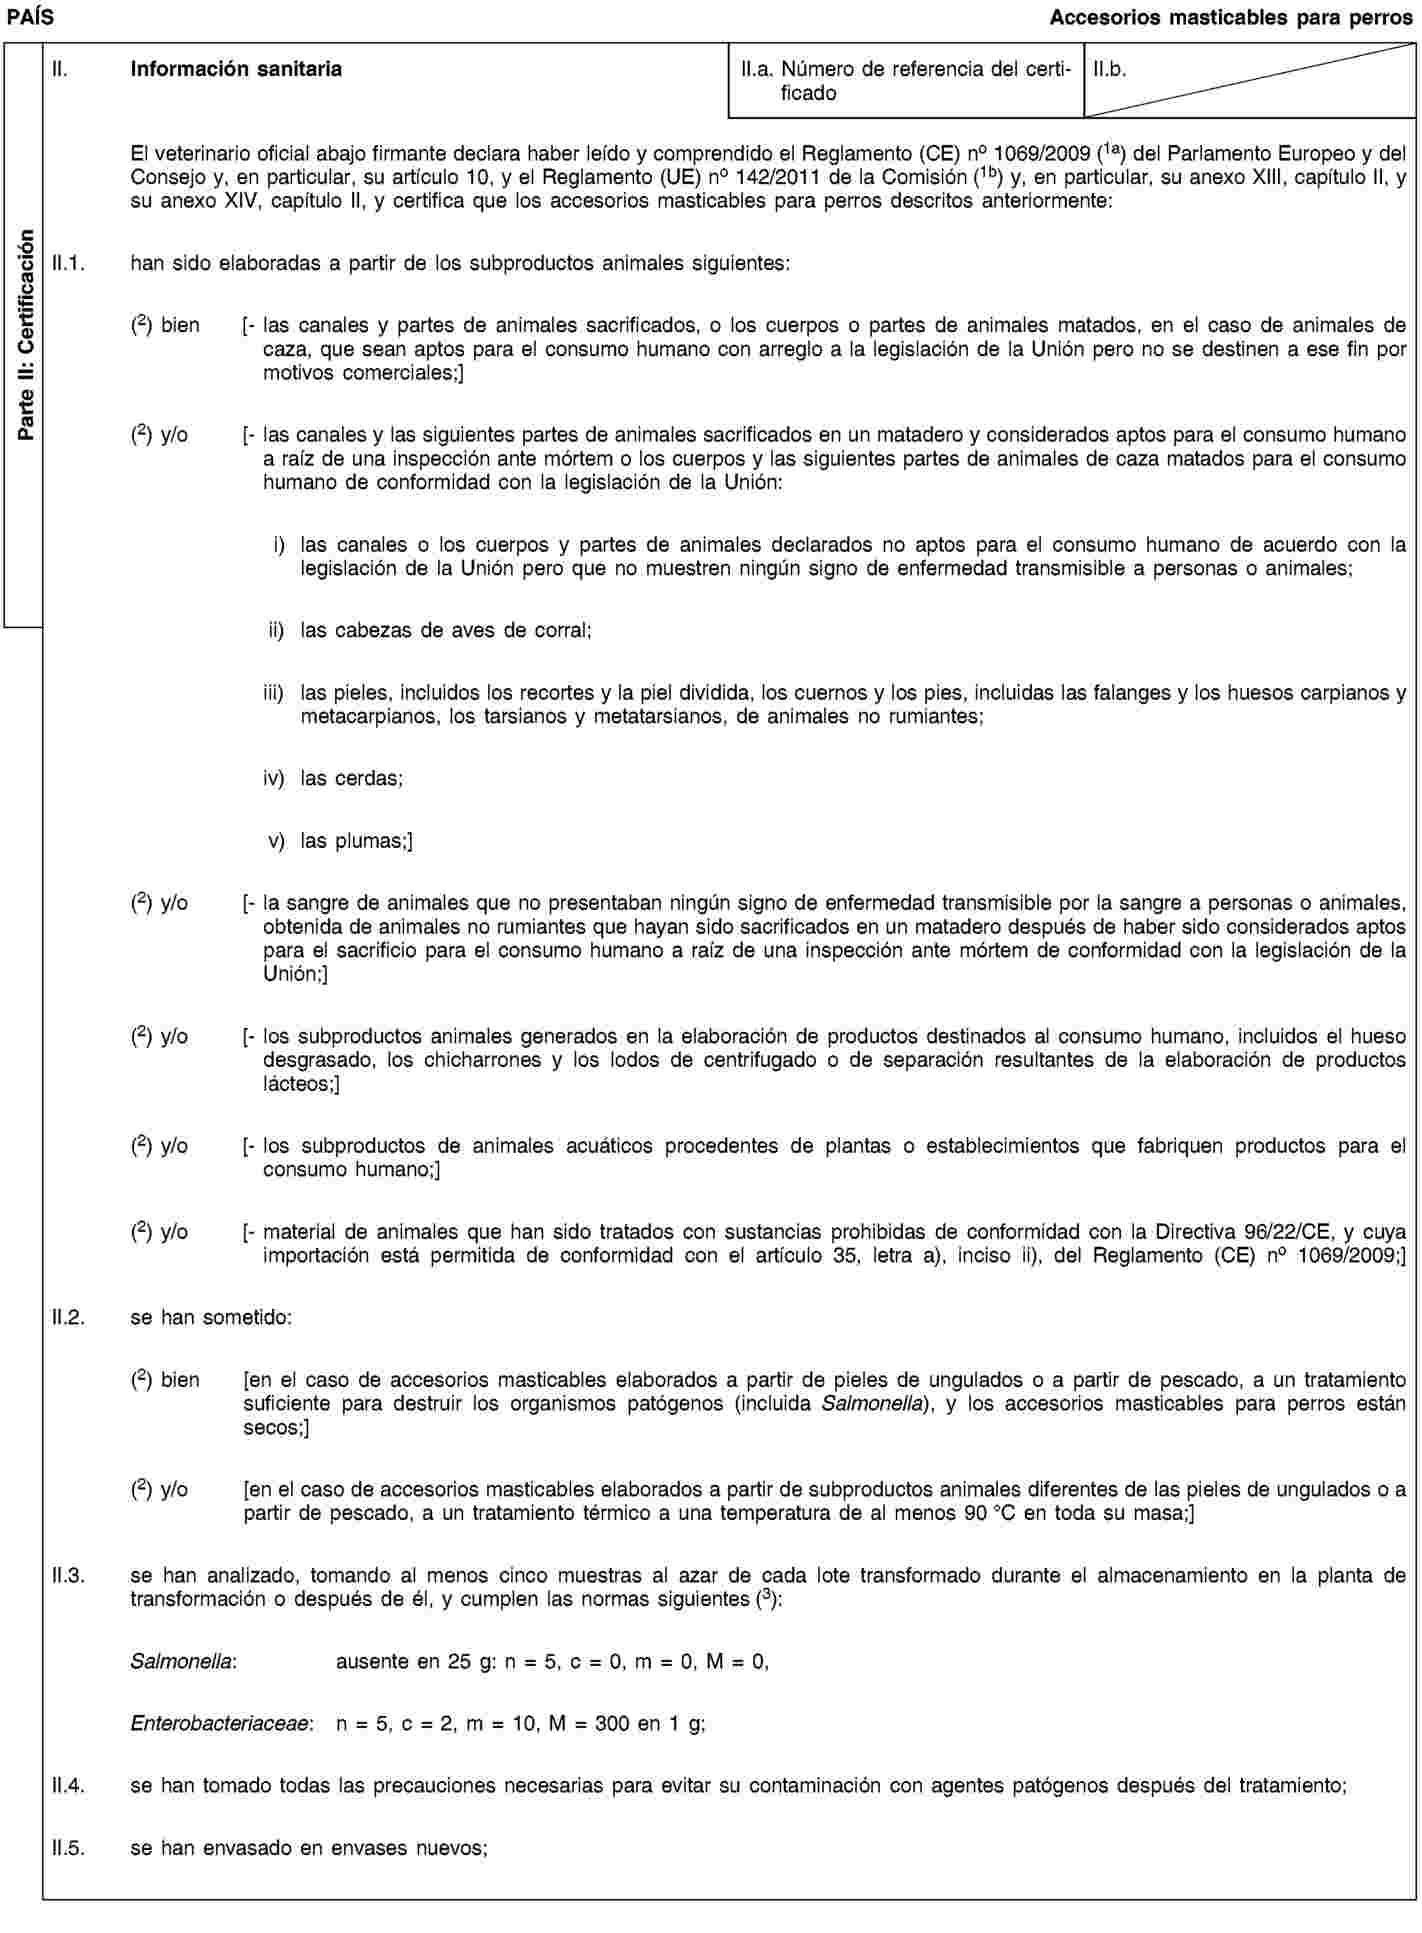 Imagen: https://eur-lex.europa.eu/resource.html?uri=uriserv:OJ.L_.2011.054.01.0001.01.SPA.xhtml.L_2011054ES.01014301.tif.jpg